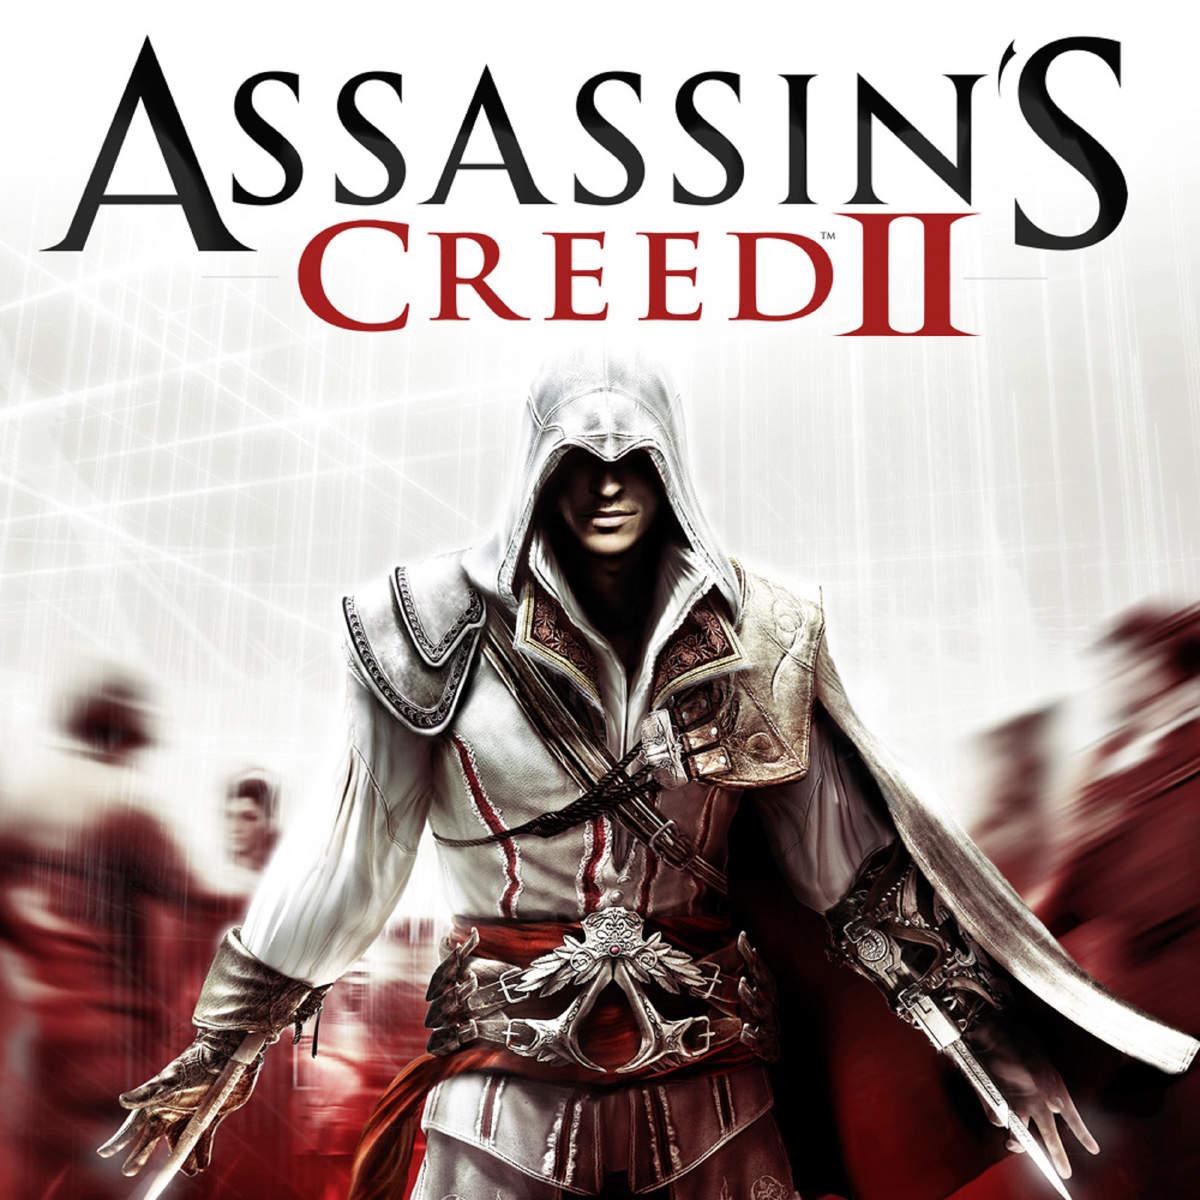 Assassins_Creed_2_Original_Game_Soundtrack_cover1200x1200.jpeg